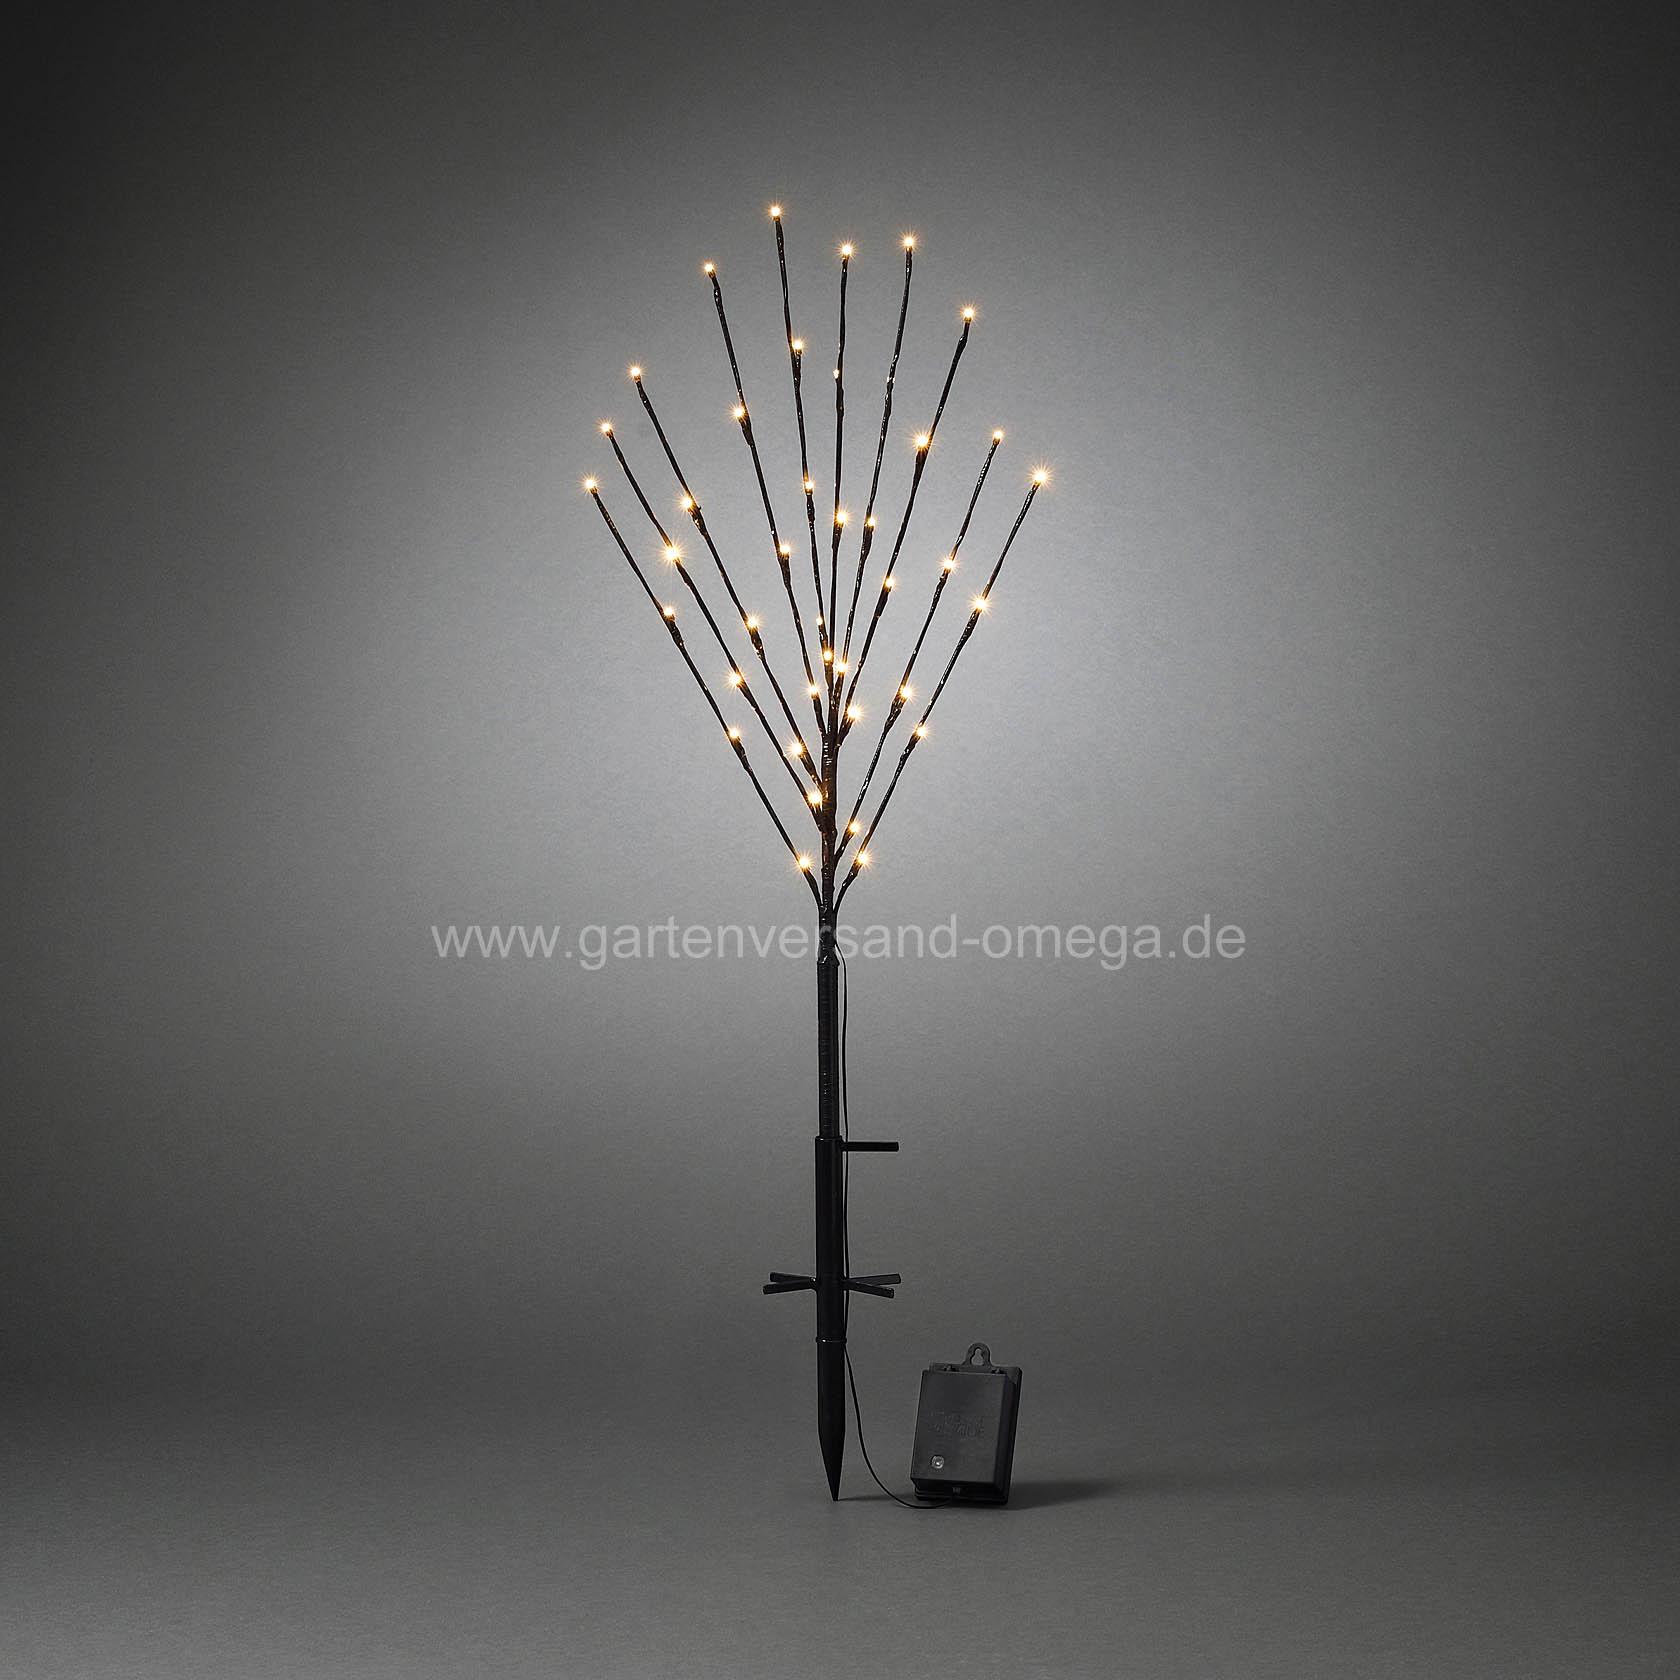 batteriebetriebener led baum batterie led dekoration f r aussen beleuchteter baum leuchtbaum. Black Bedroom Furniture Sets. Home Design Ideas